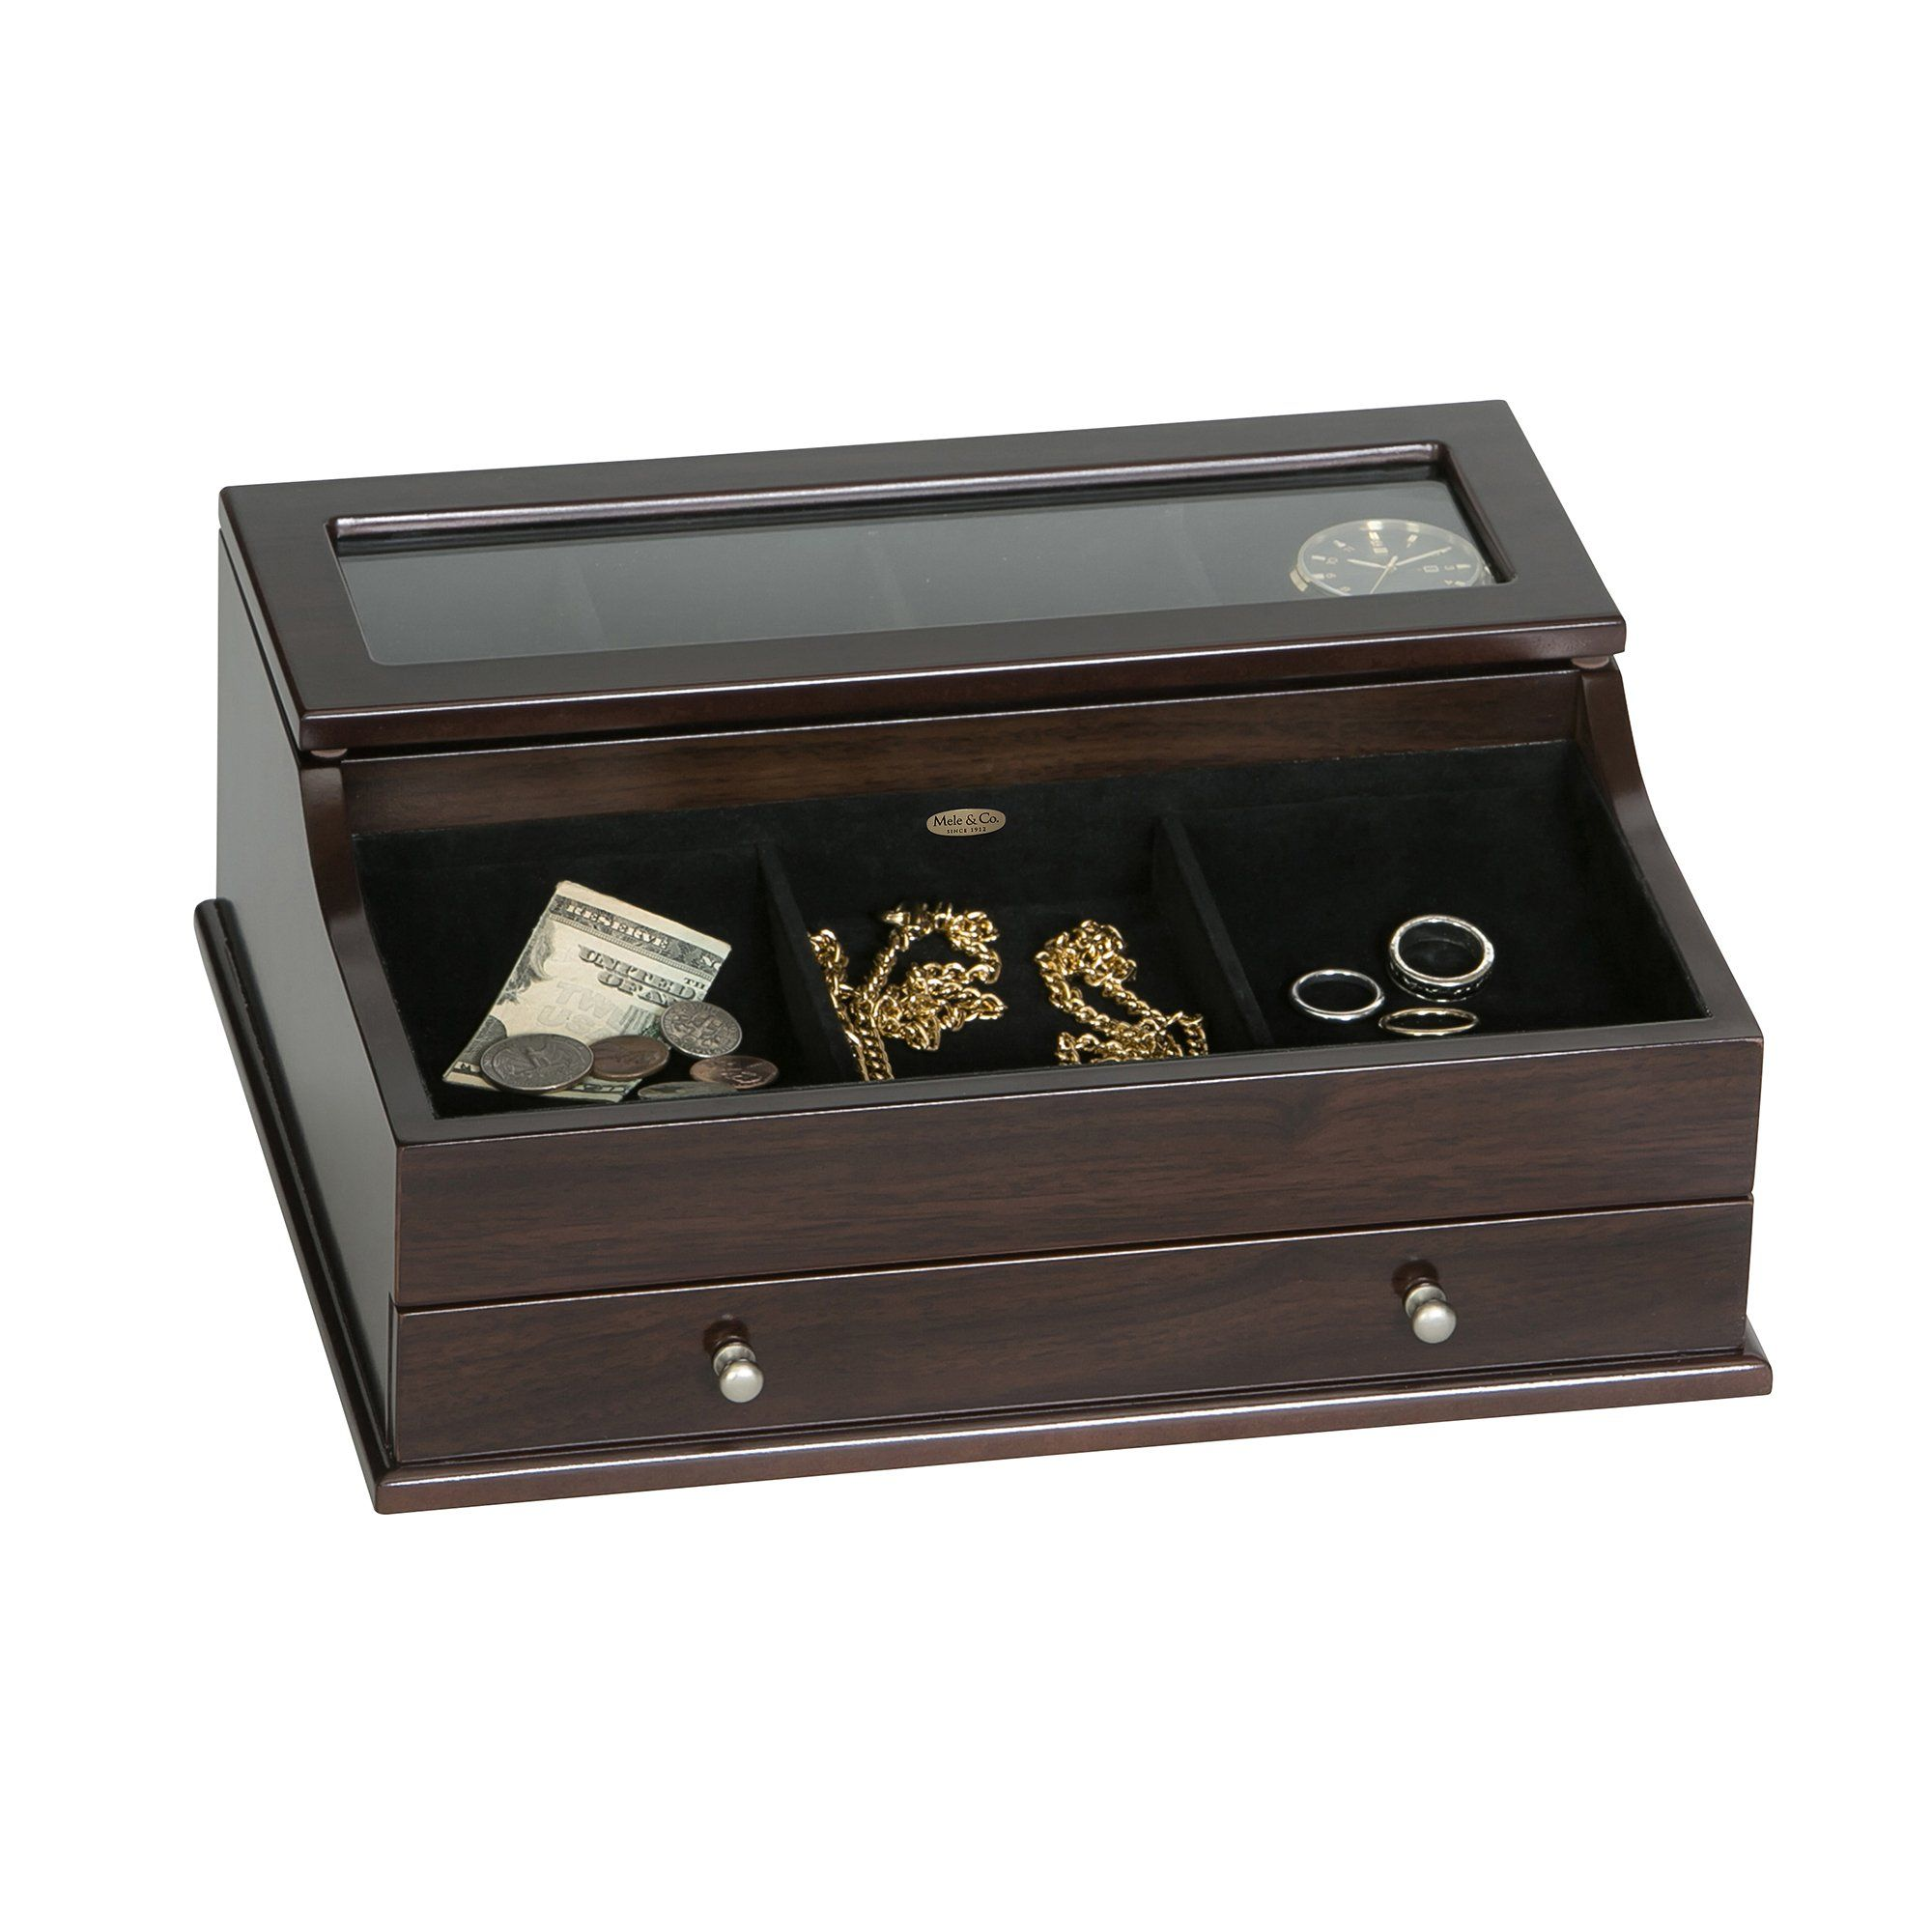 Hampden Mens Jewelry Box Jewlery Box Men Mele Co Jewelry Box Hampden Mens Jewelry Box Mens Jewelry Box Wooden Dresser Mens Jewelry